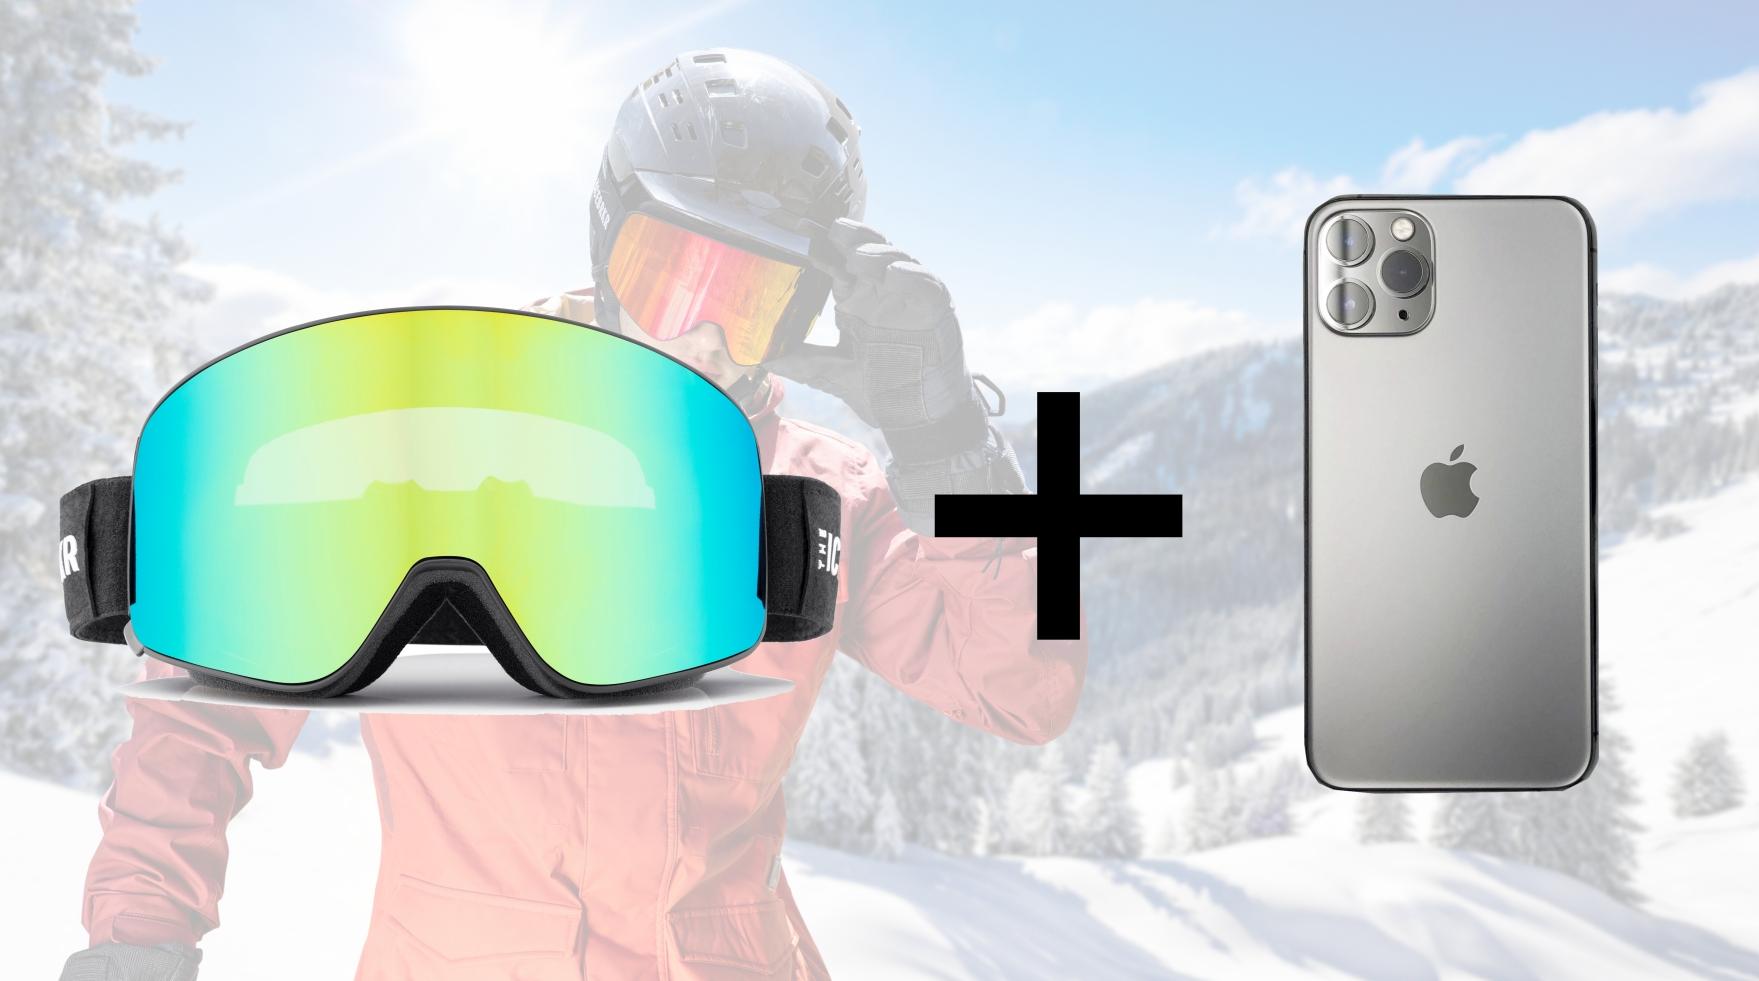 Bluetooth 5.0 MESHインカムテクノロジーと骨伝導オーディオを搭載したスノーゴーグル【IceBRKR(アイスブレーカー)】